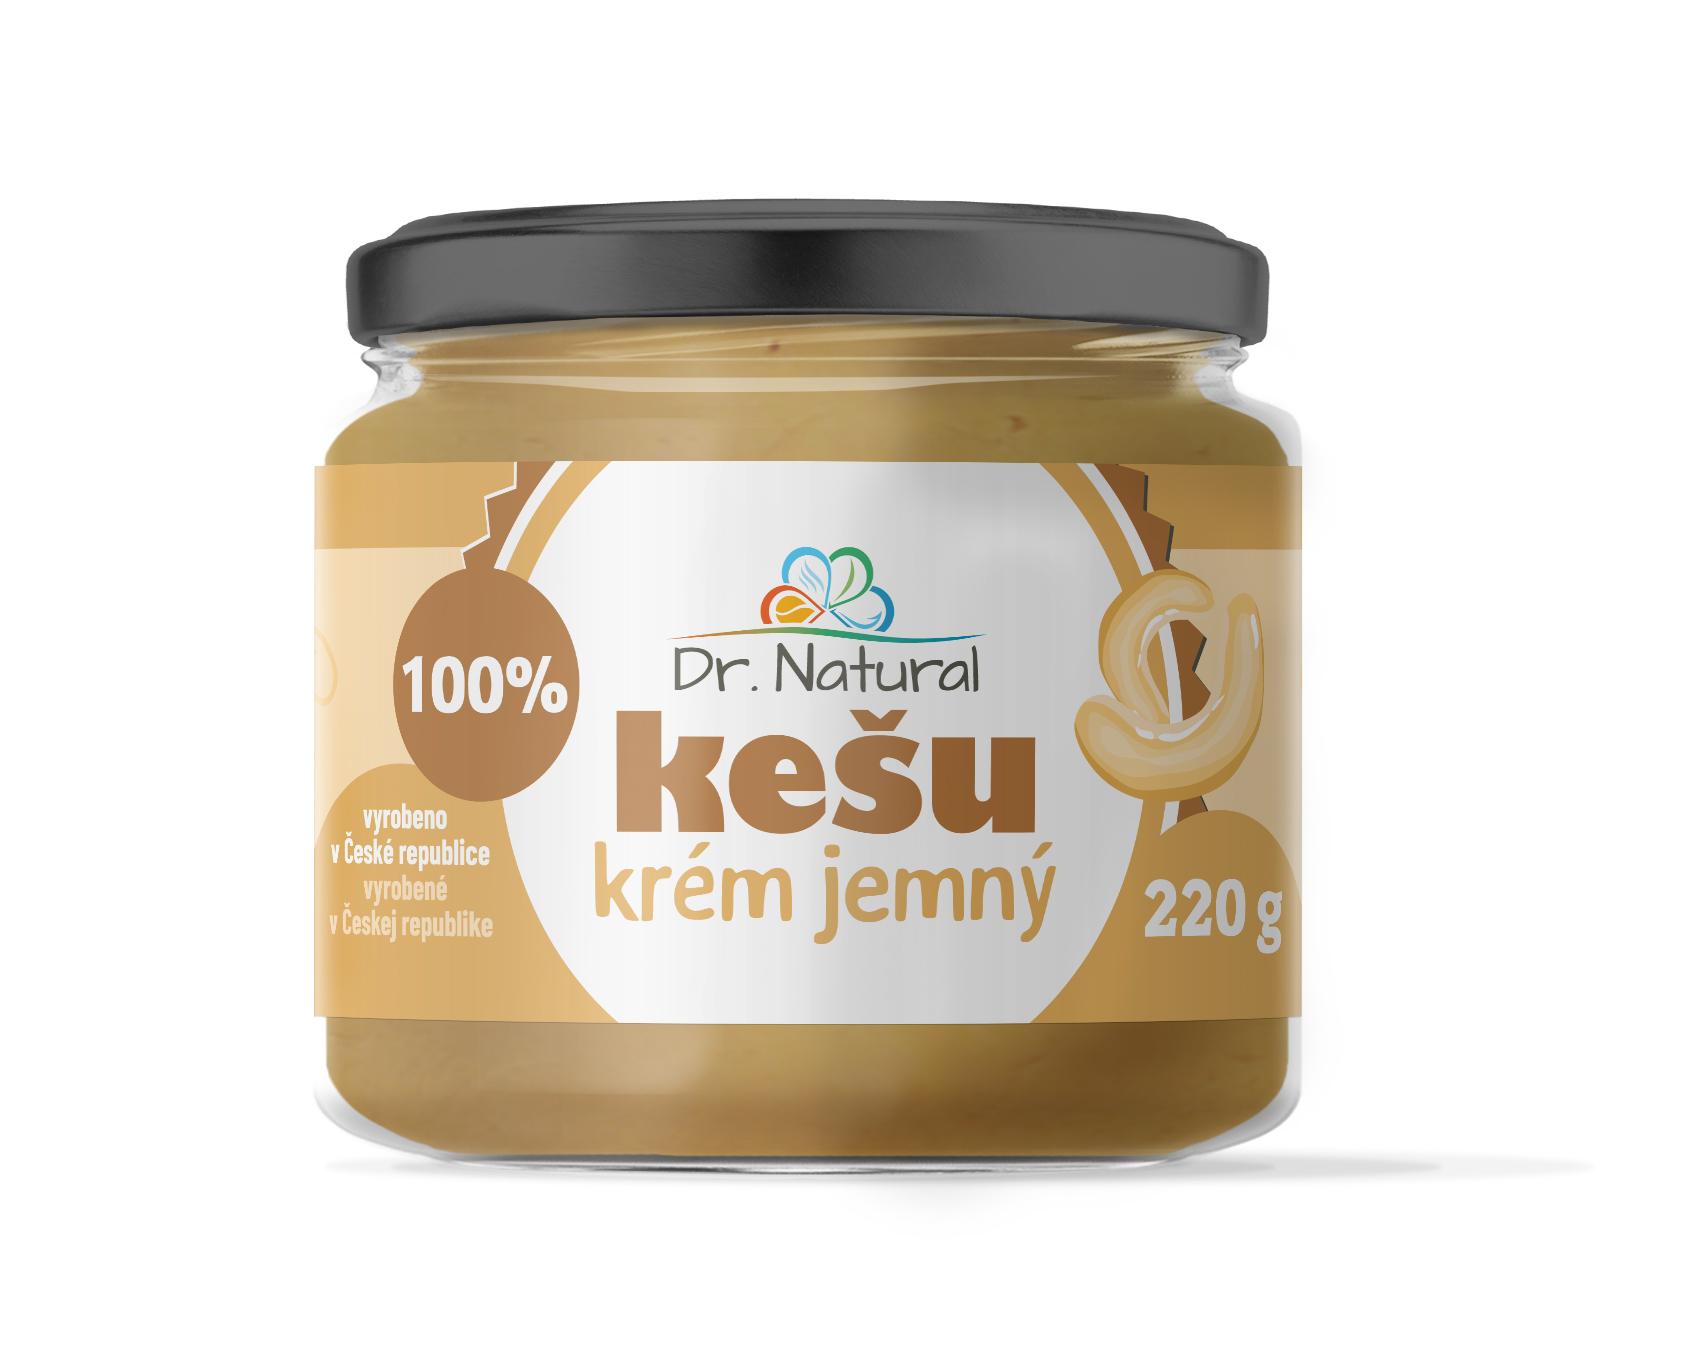 Dr.Natural Kešu krém jemný 220g 100%